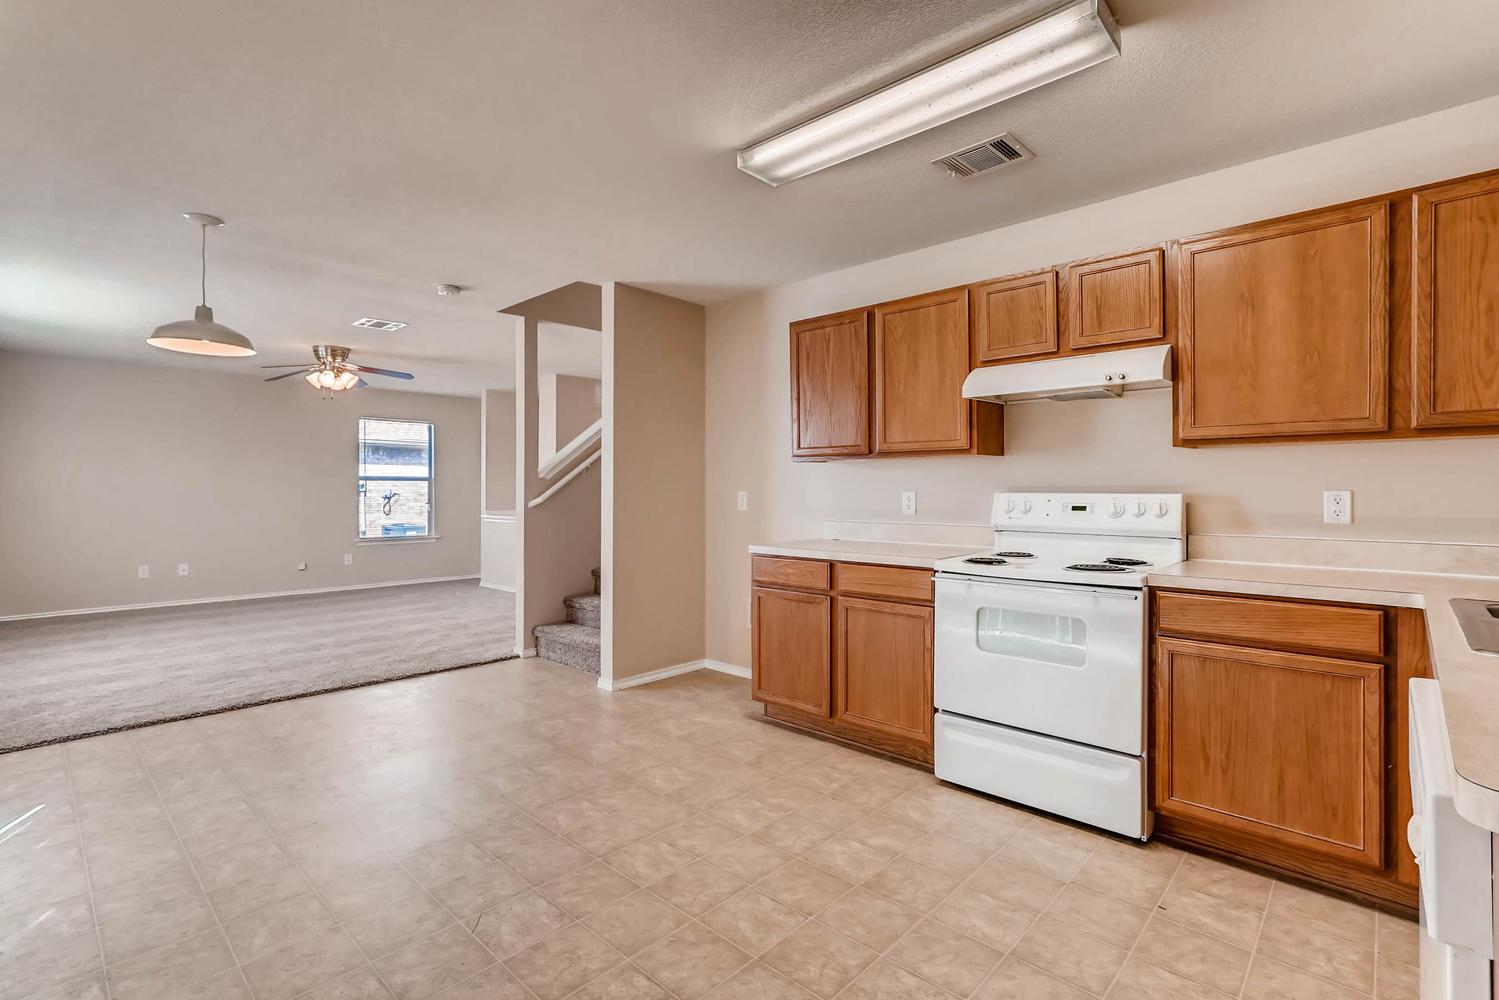 Photo of 206 Christie Lane, Waxahachie, TX, 75165